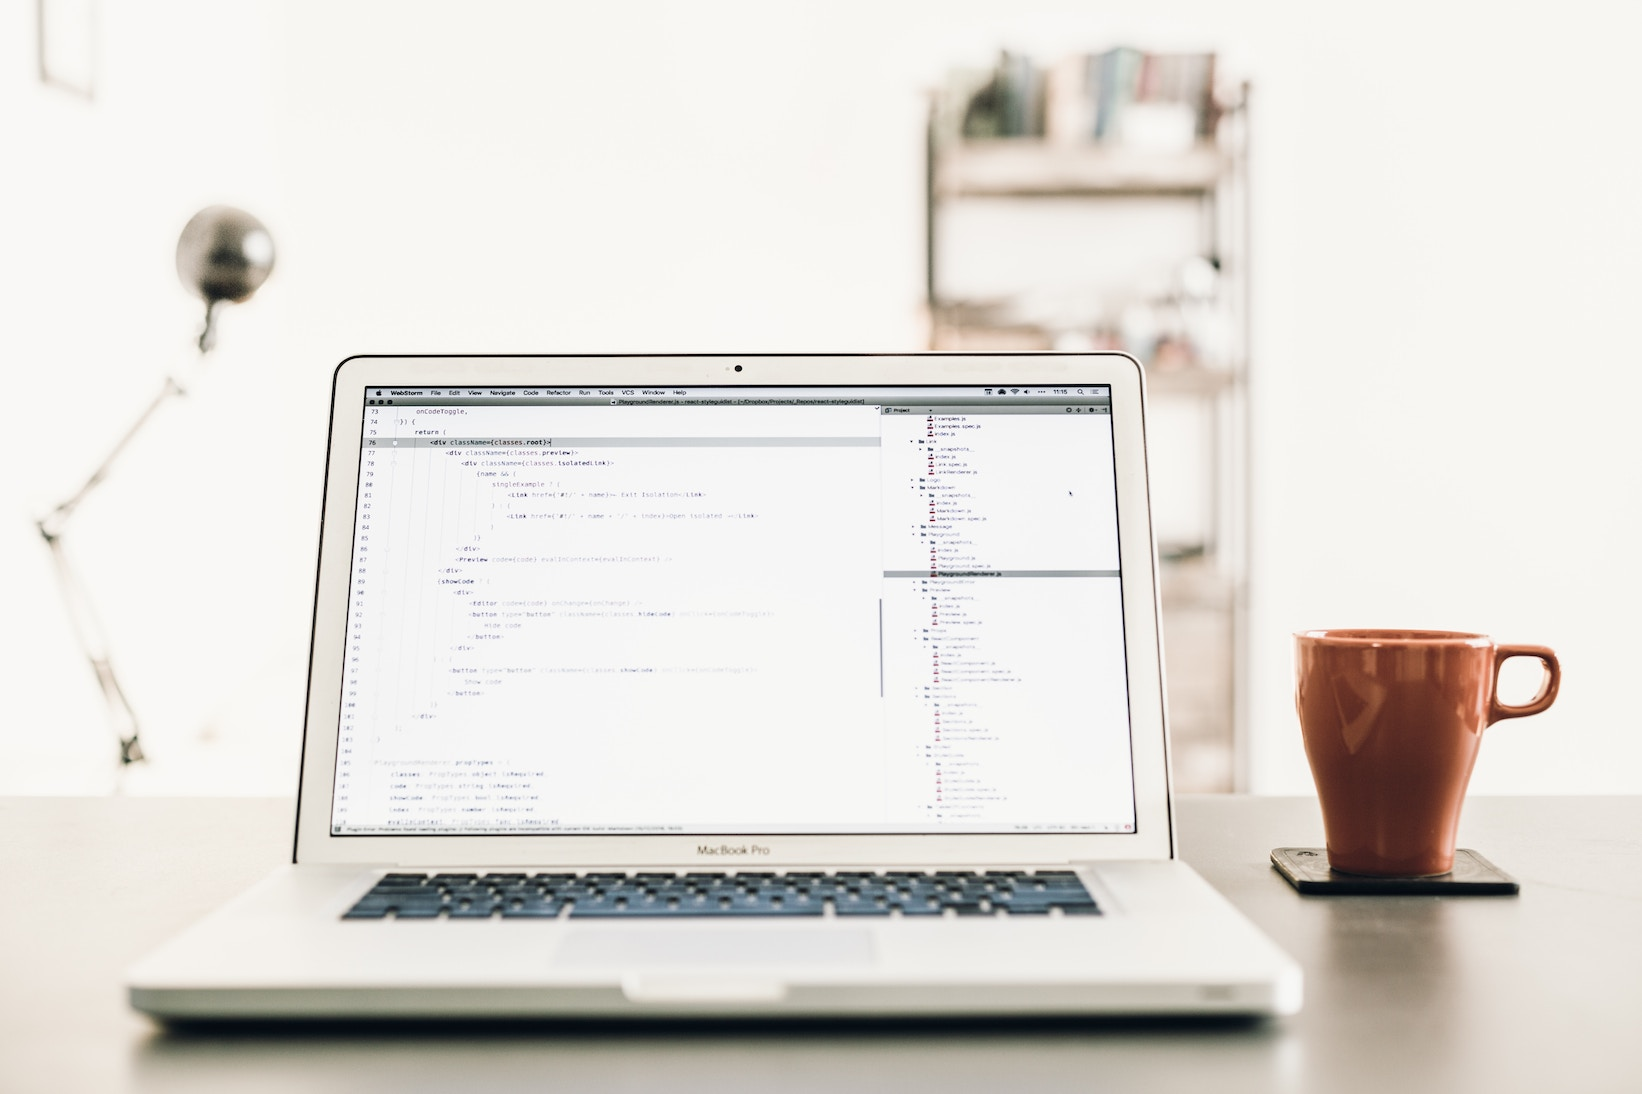 Image of a computer looking at actor social media information